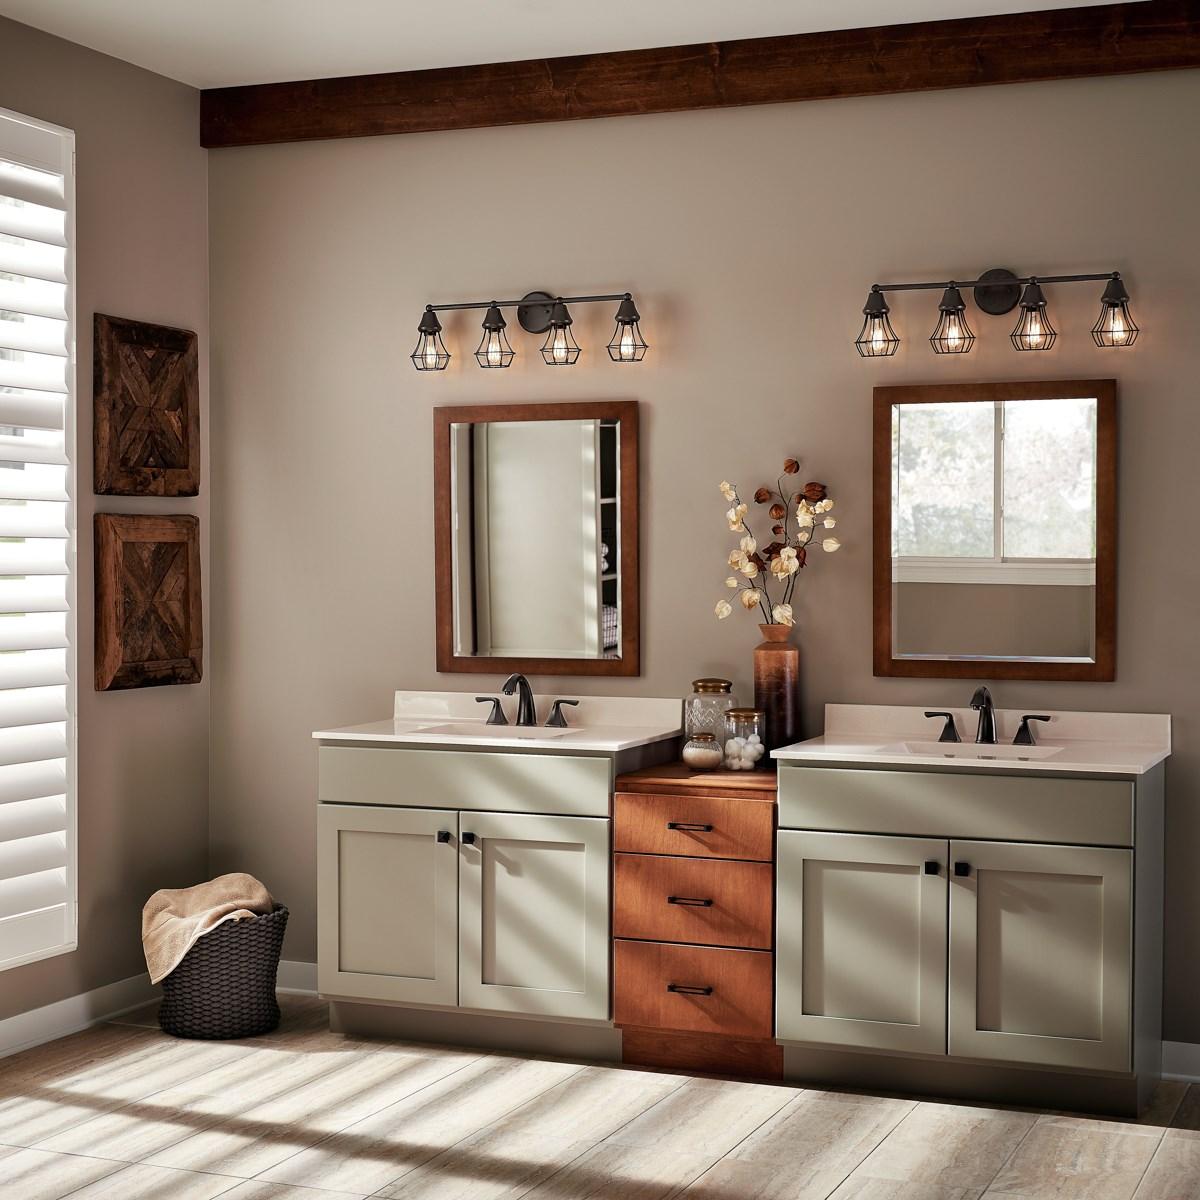 Bayley™ 4 Light Vanity Light Olde Bronze® | Kichler Lighting